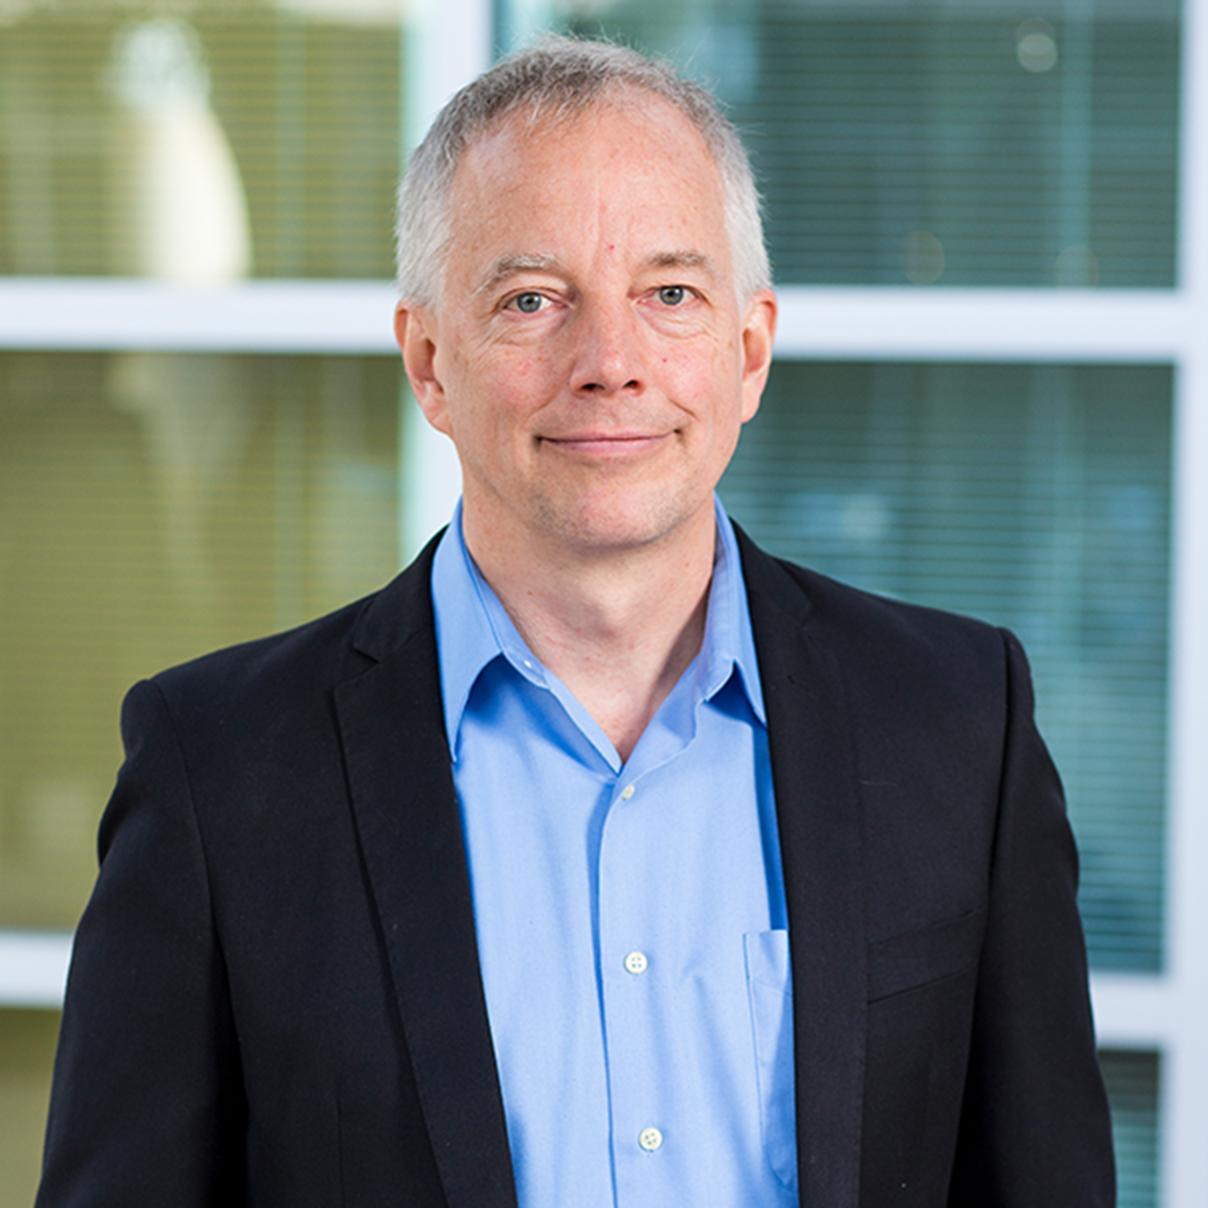 Dr. Jim Olson